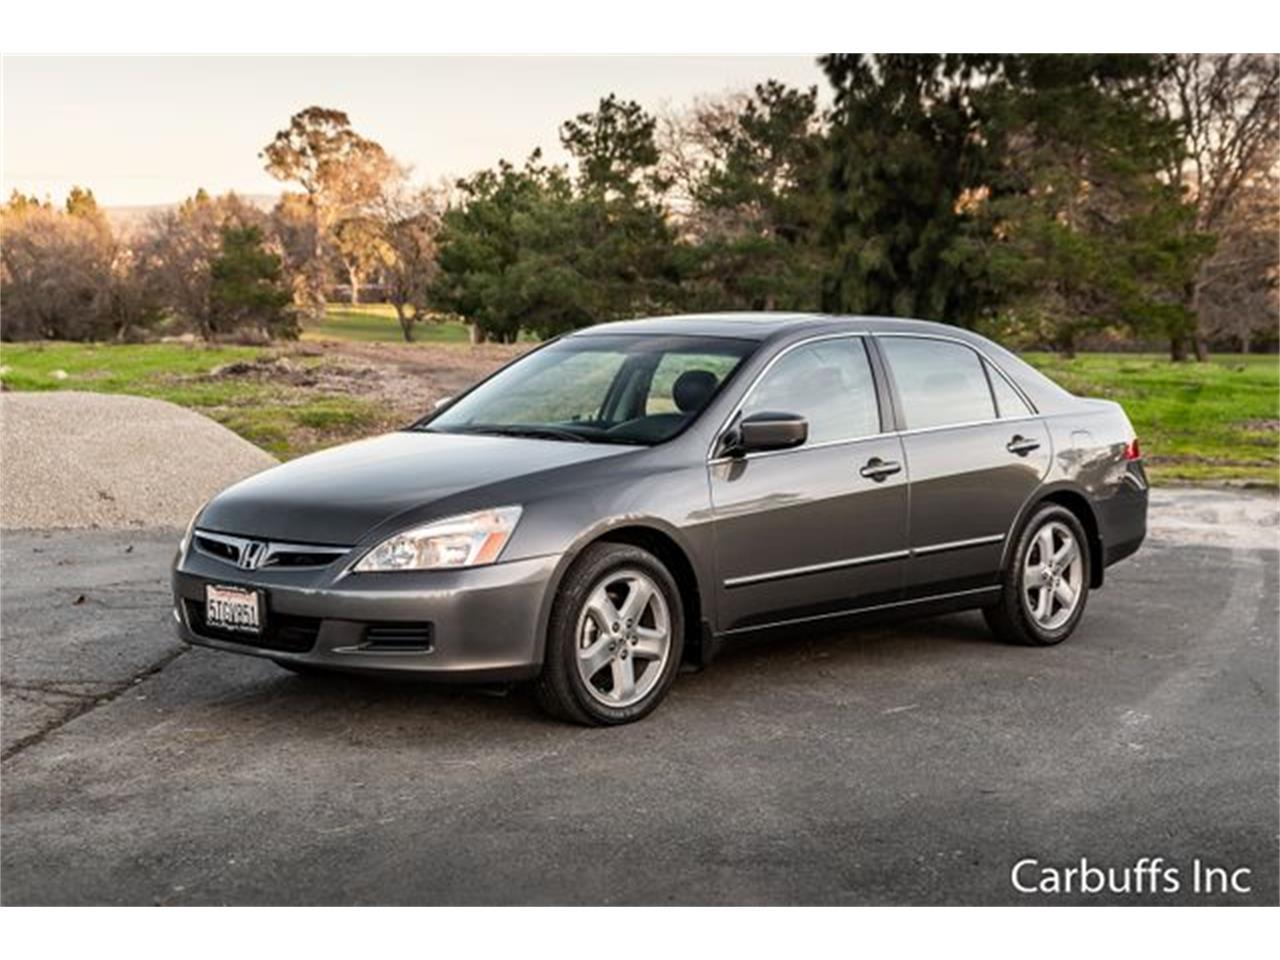 for sale 2006 honda accord in concord, california cars - concord, ca at geebo